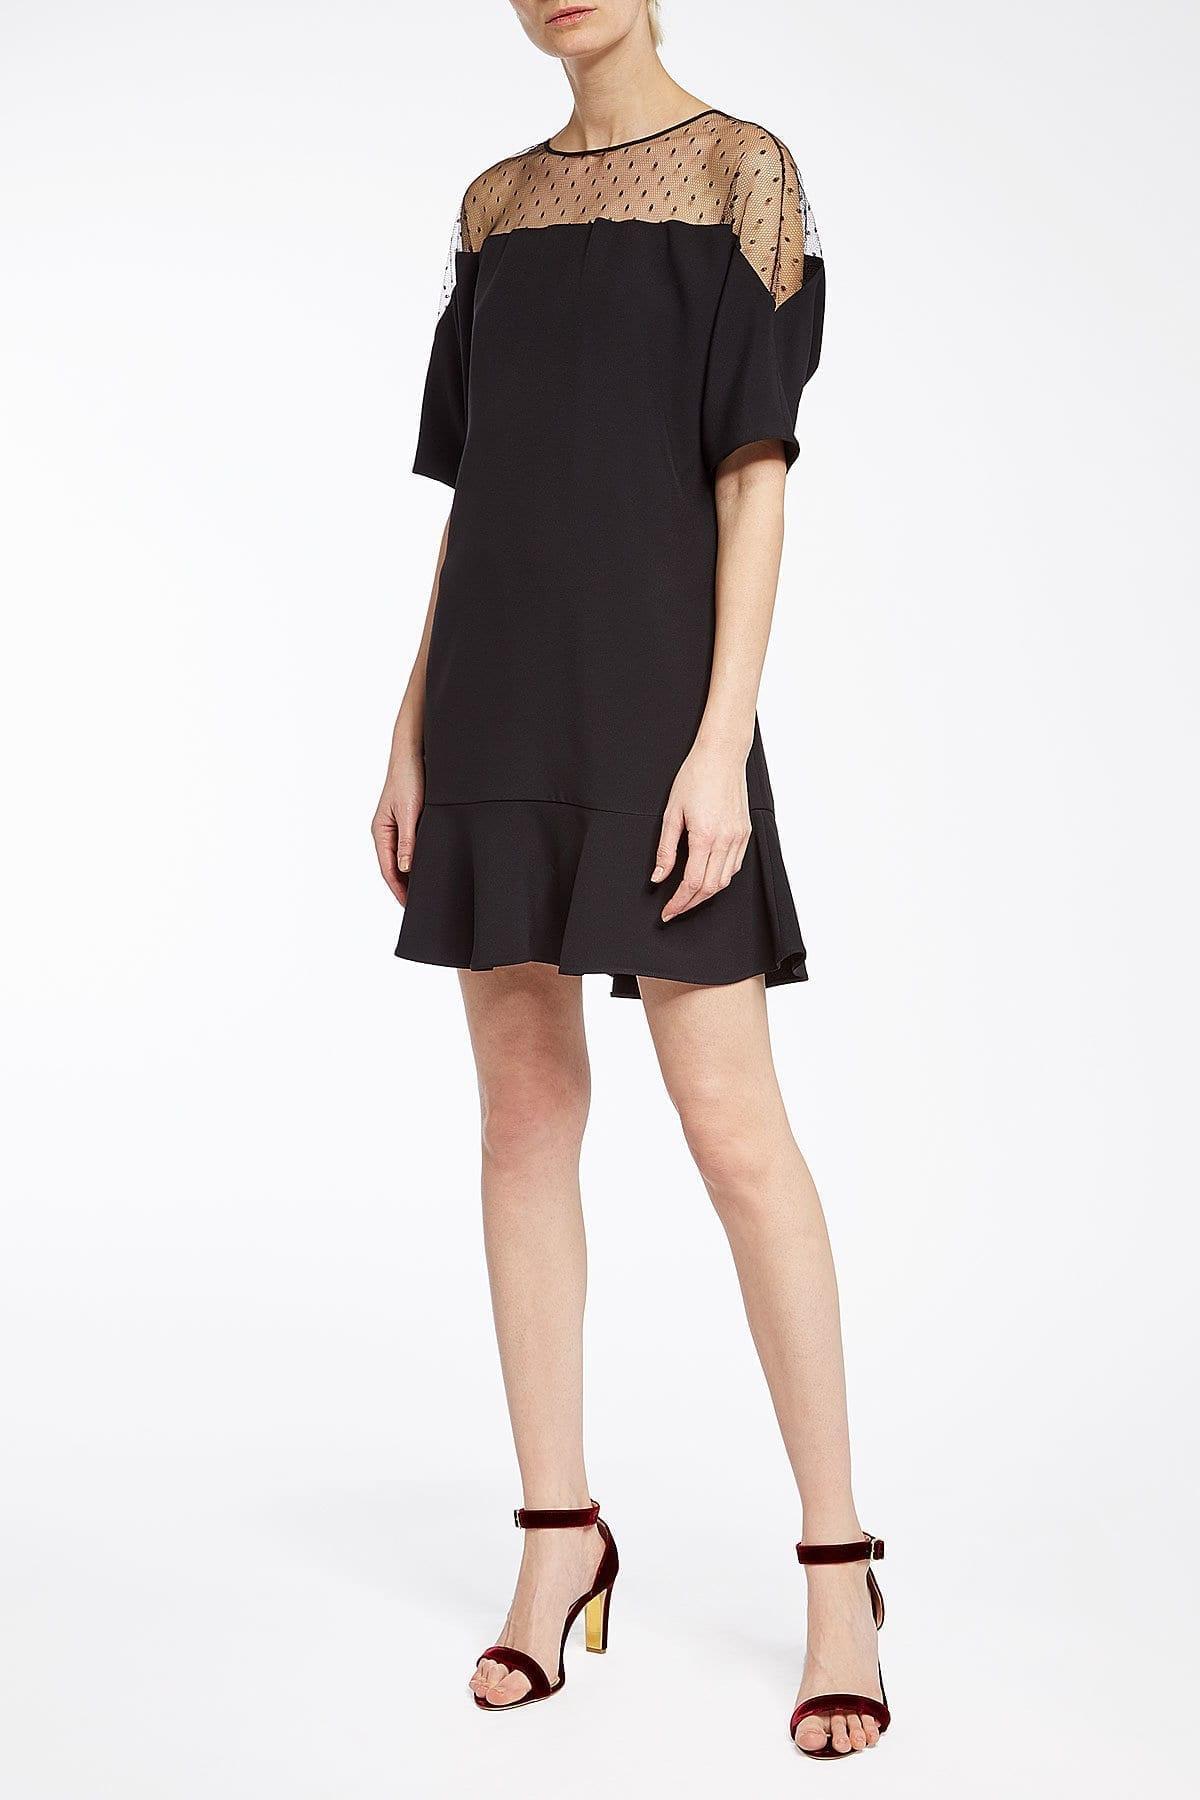 Red Valentino Point Desprit Mini Black Dress